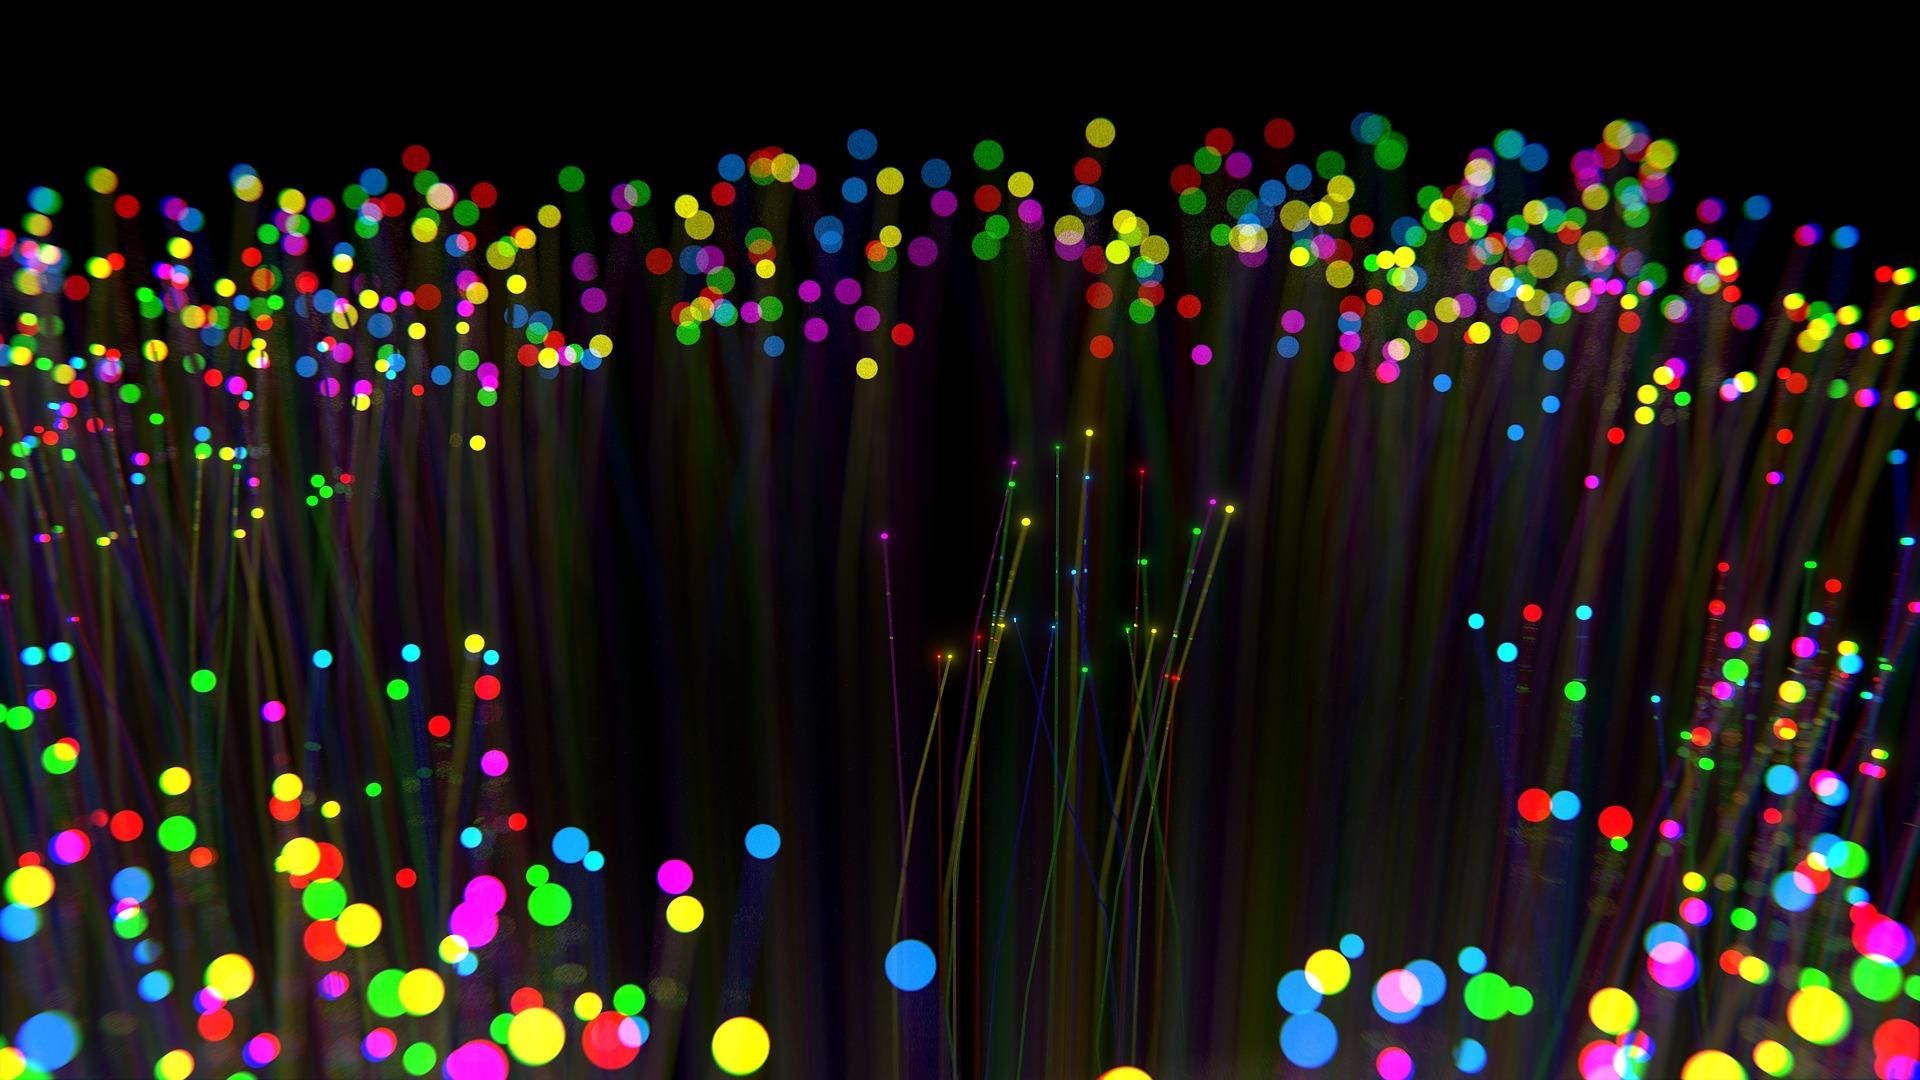 fiber-optic-charles-kao.jpg